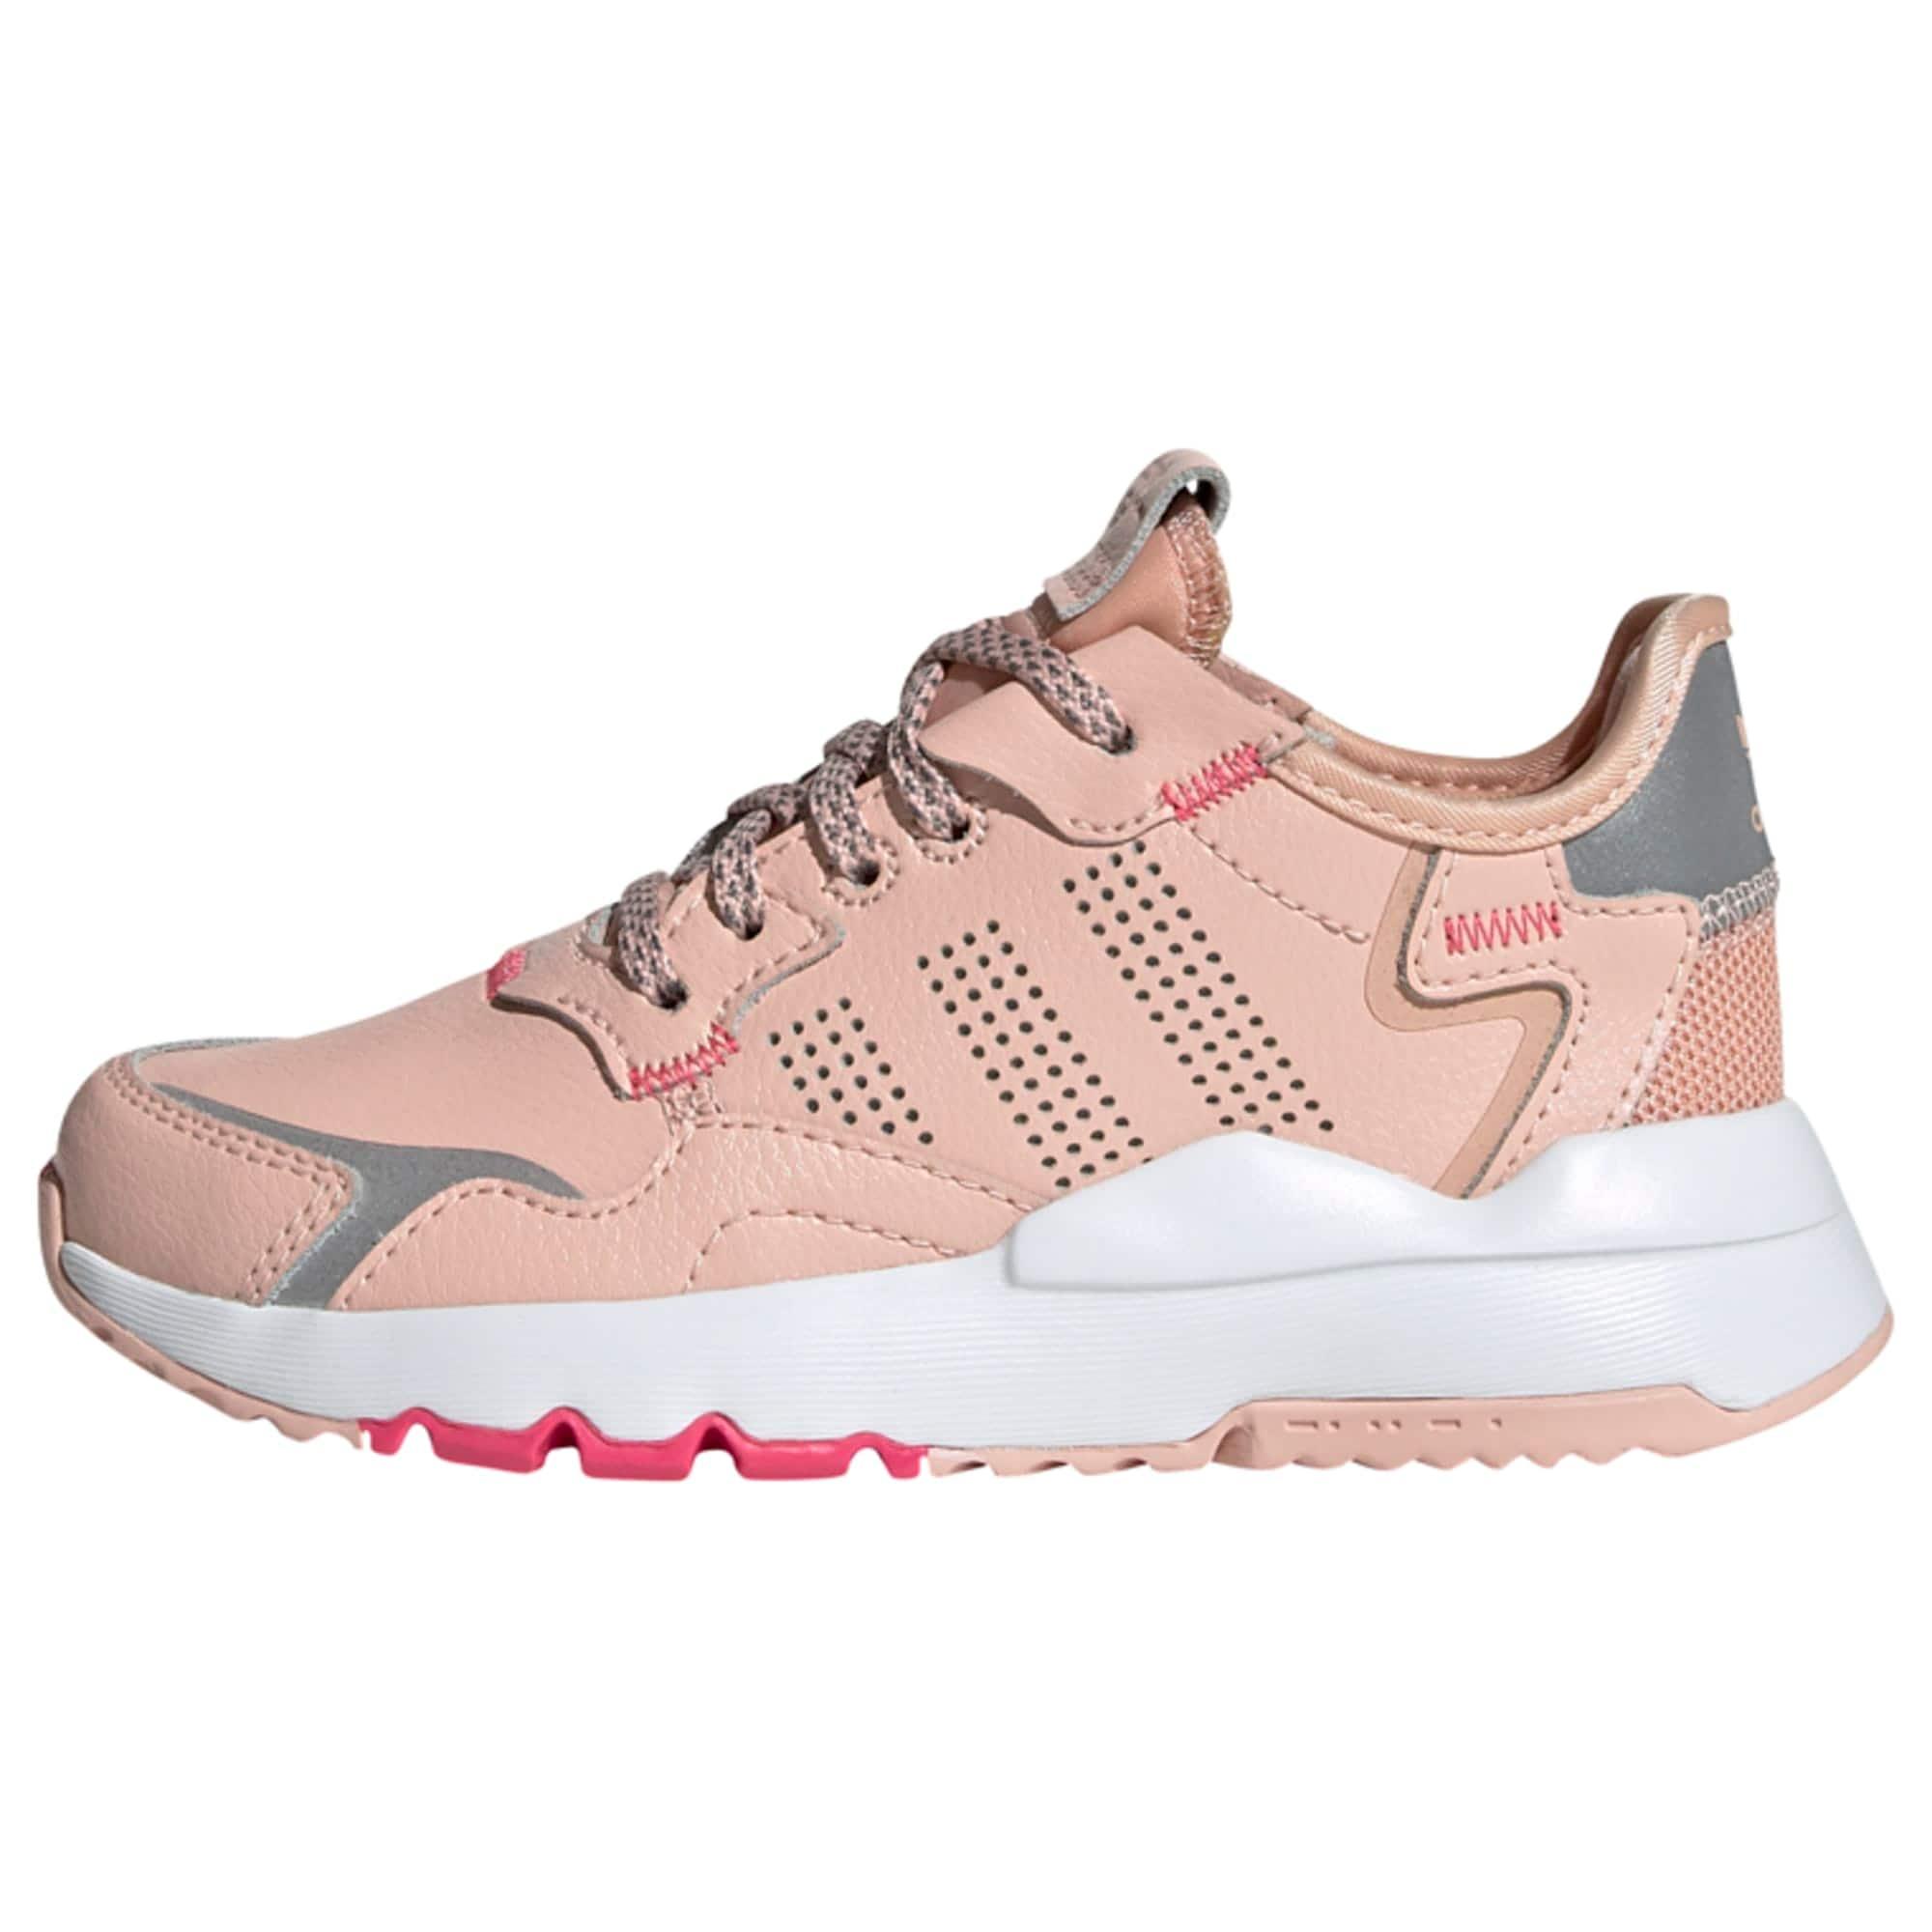 ADIDAS ORIGINALS Tenisky  biela / pastelovo ružová / sivá